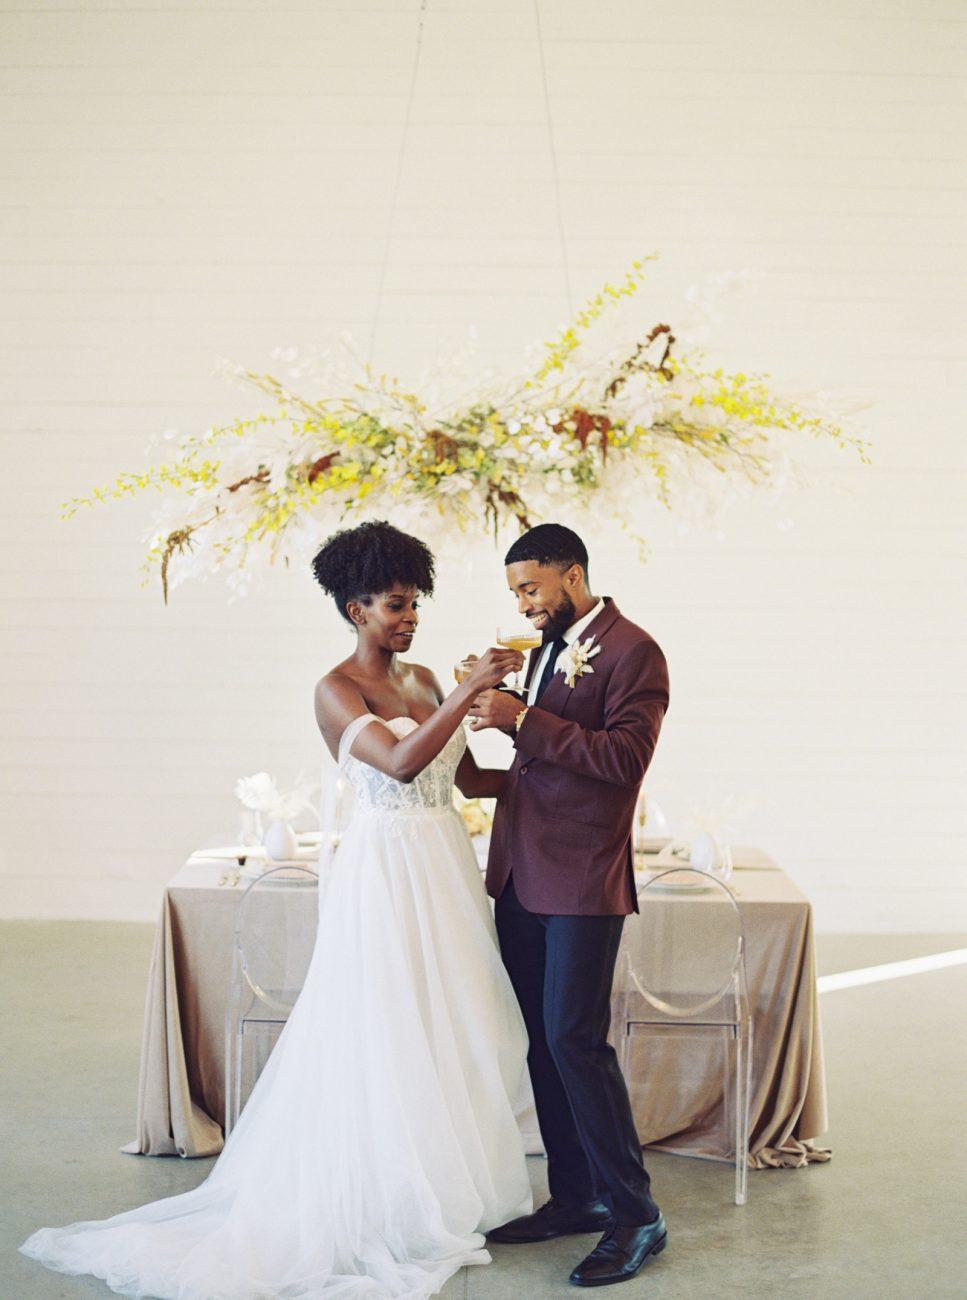 Couple Having a toast at Prospect House Wedding Venue in Austin, Texas